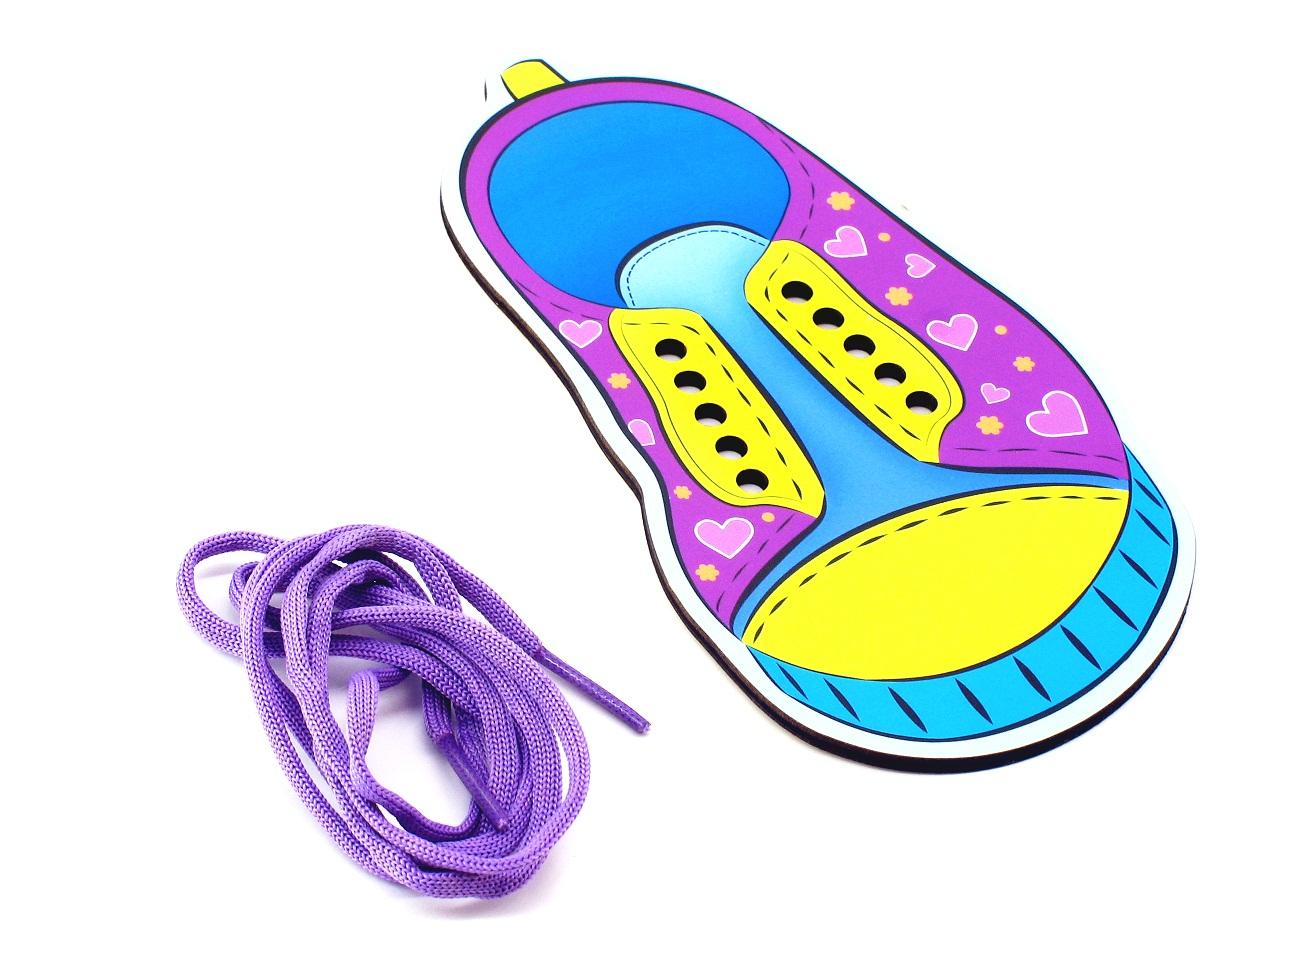 Шнуровка - Обувь по цене 160